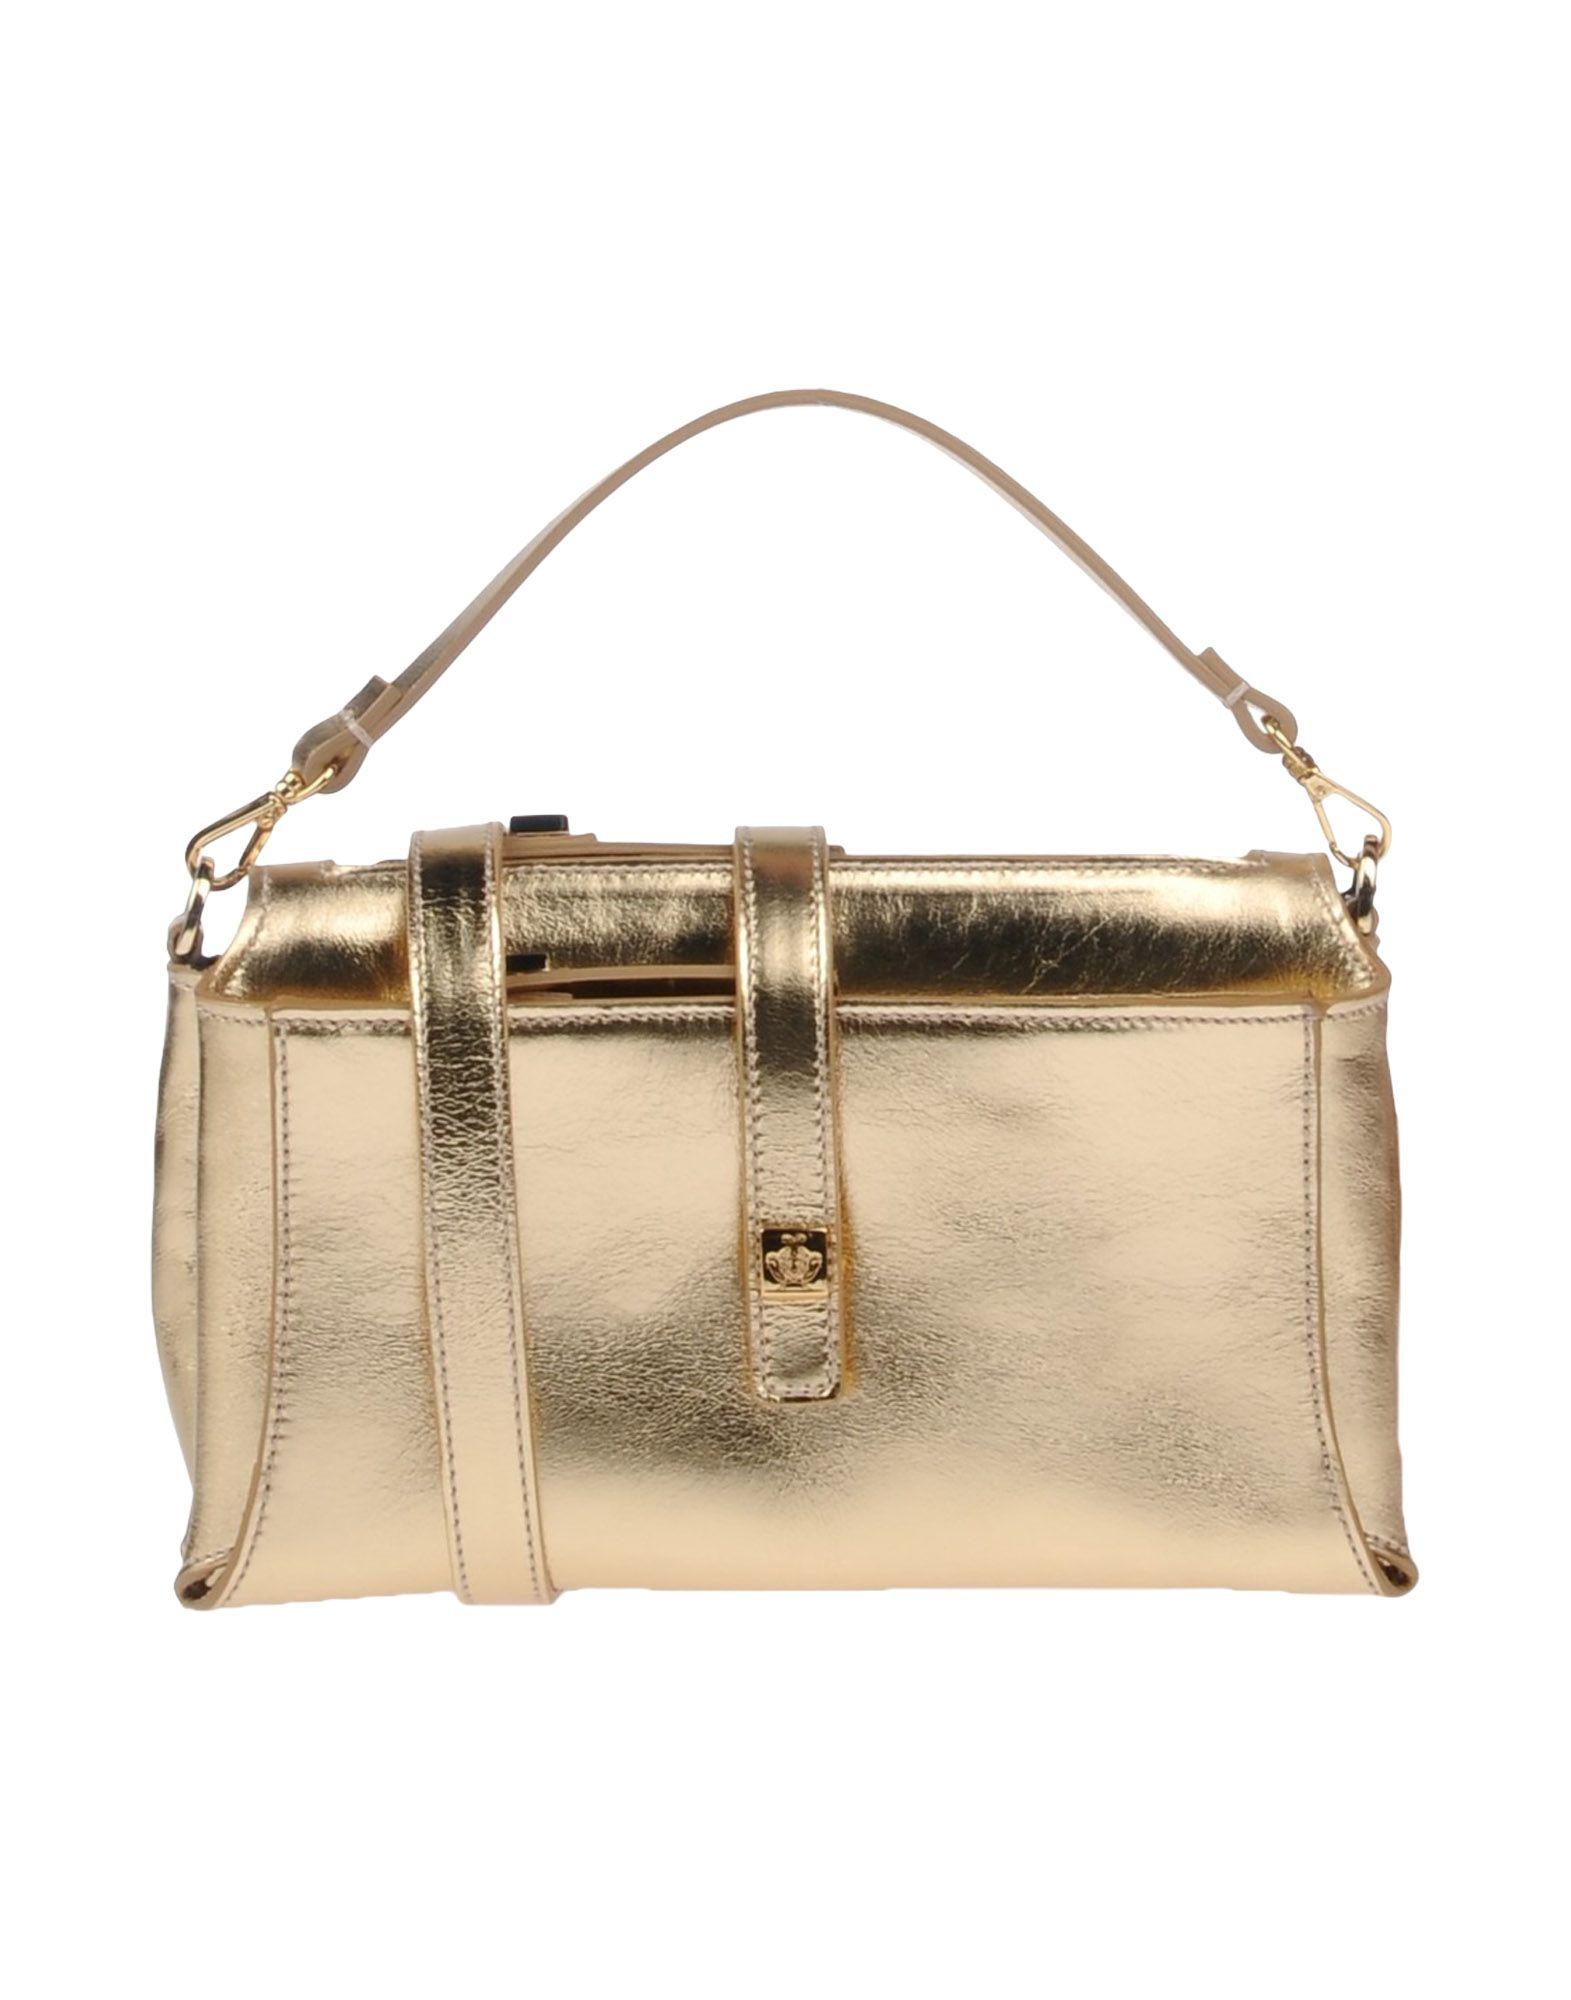 GIANCARLO PETRIGLIA Handbag in Gold